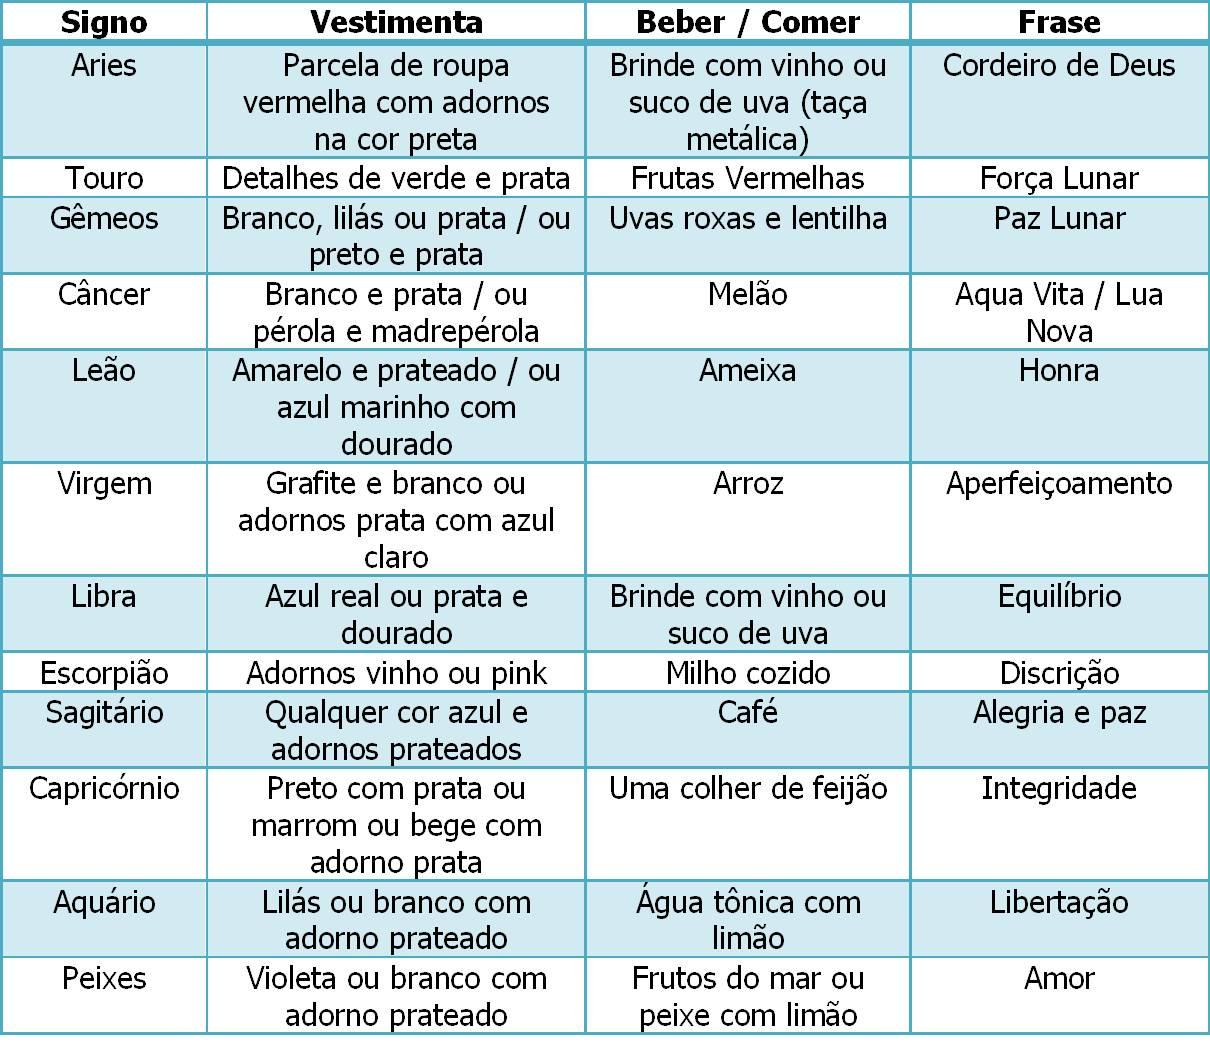 Frases De Signos 39 Frases